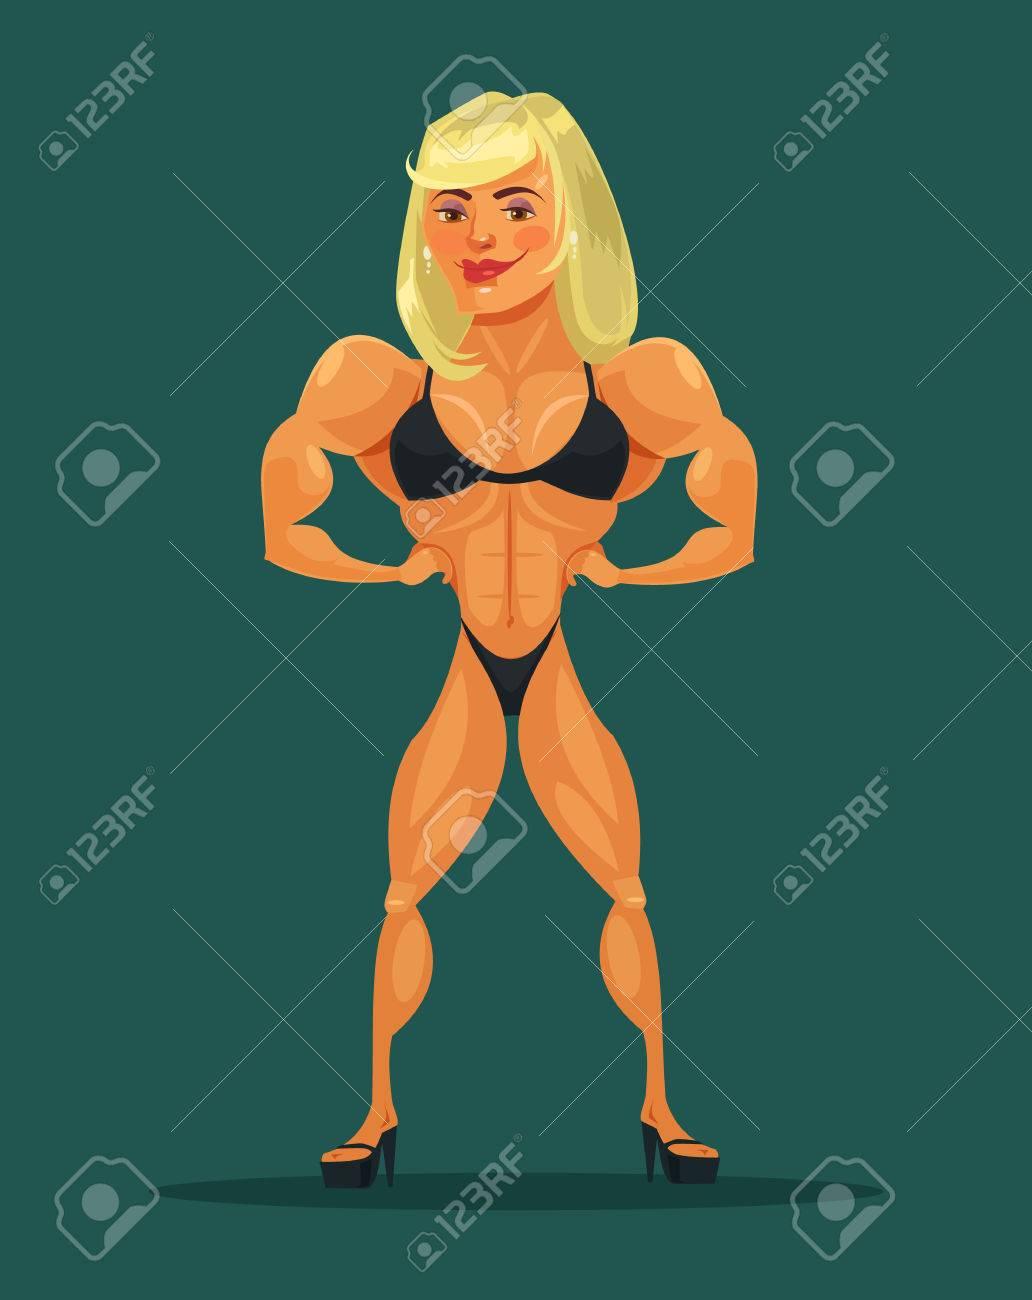 Vector Woman Bodybuilder Vector Flat Cartoon Illustration